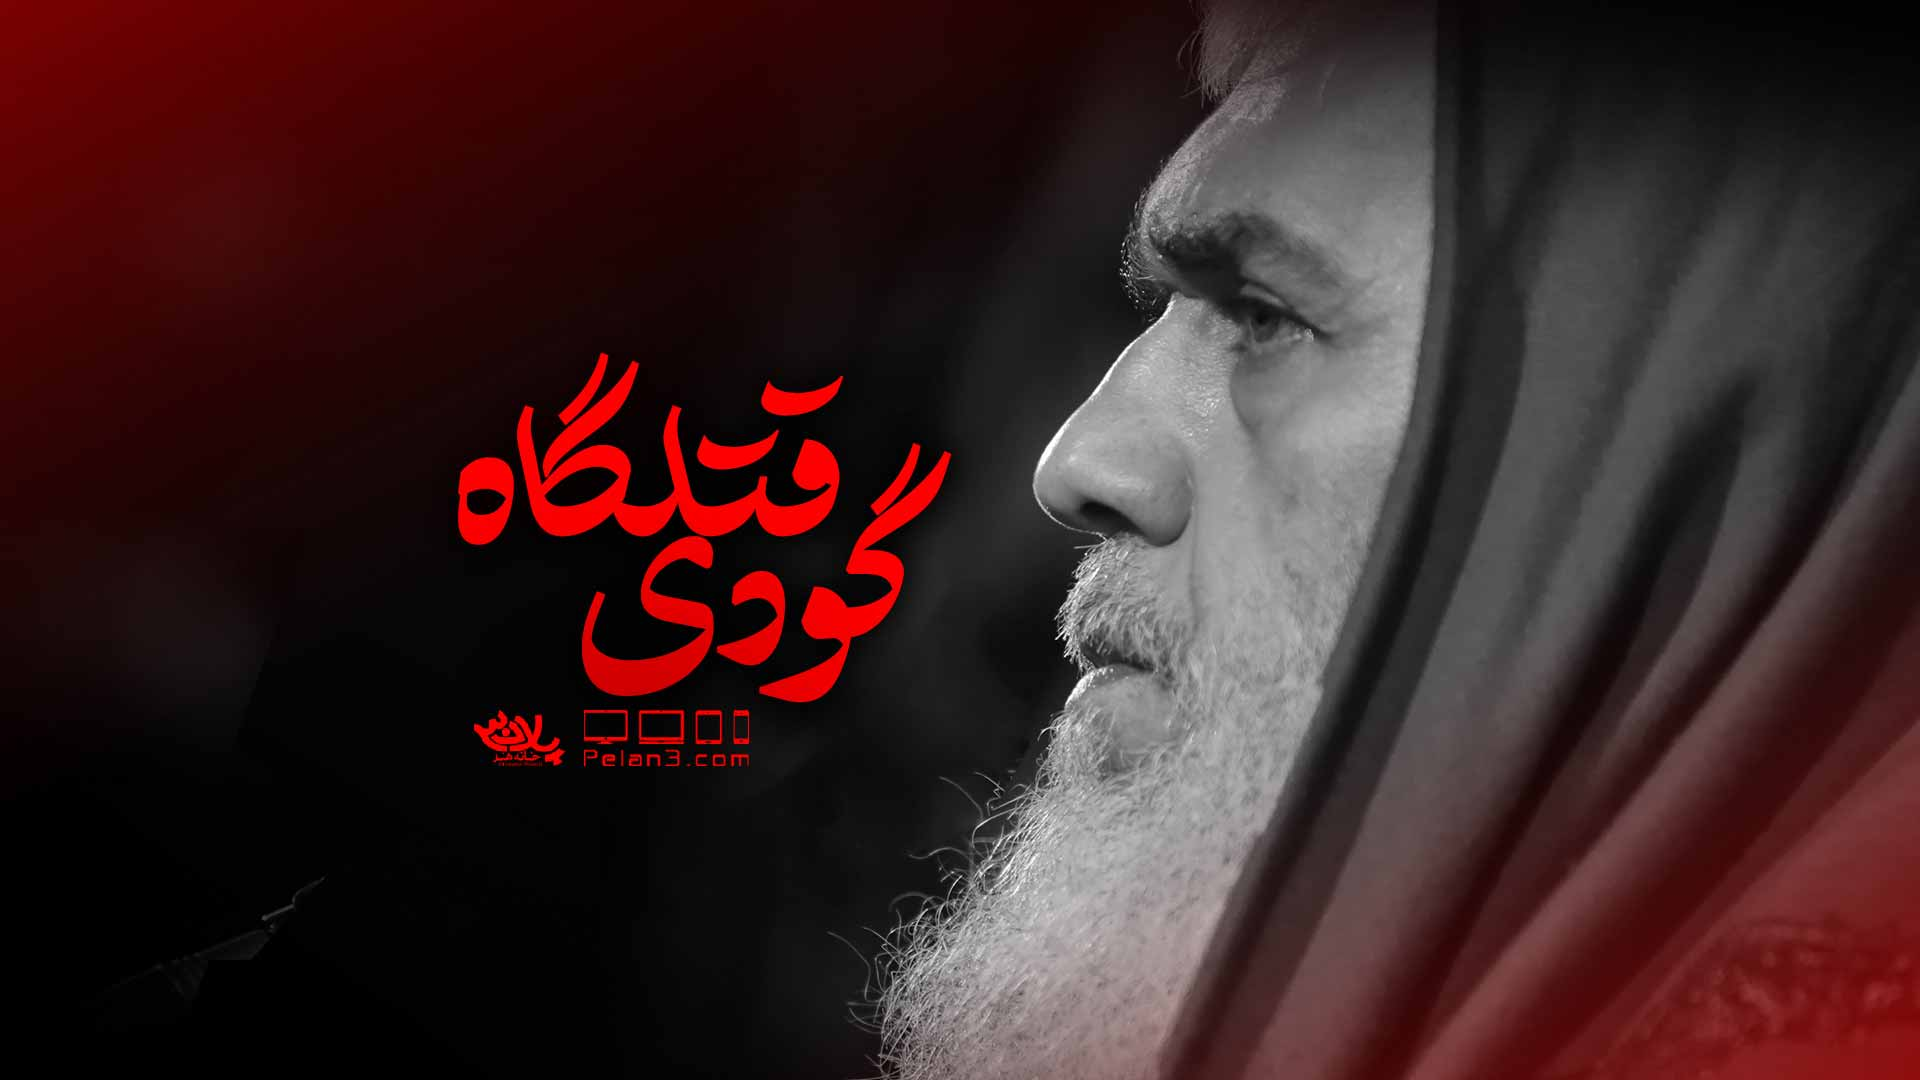 گودی قتلگاه سیدحسین مومنی